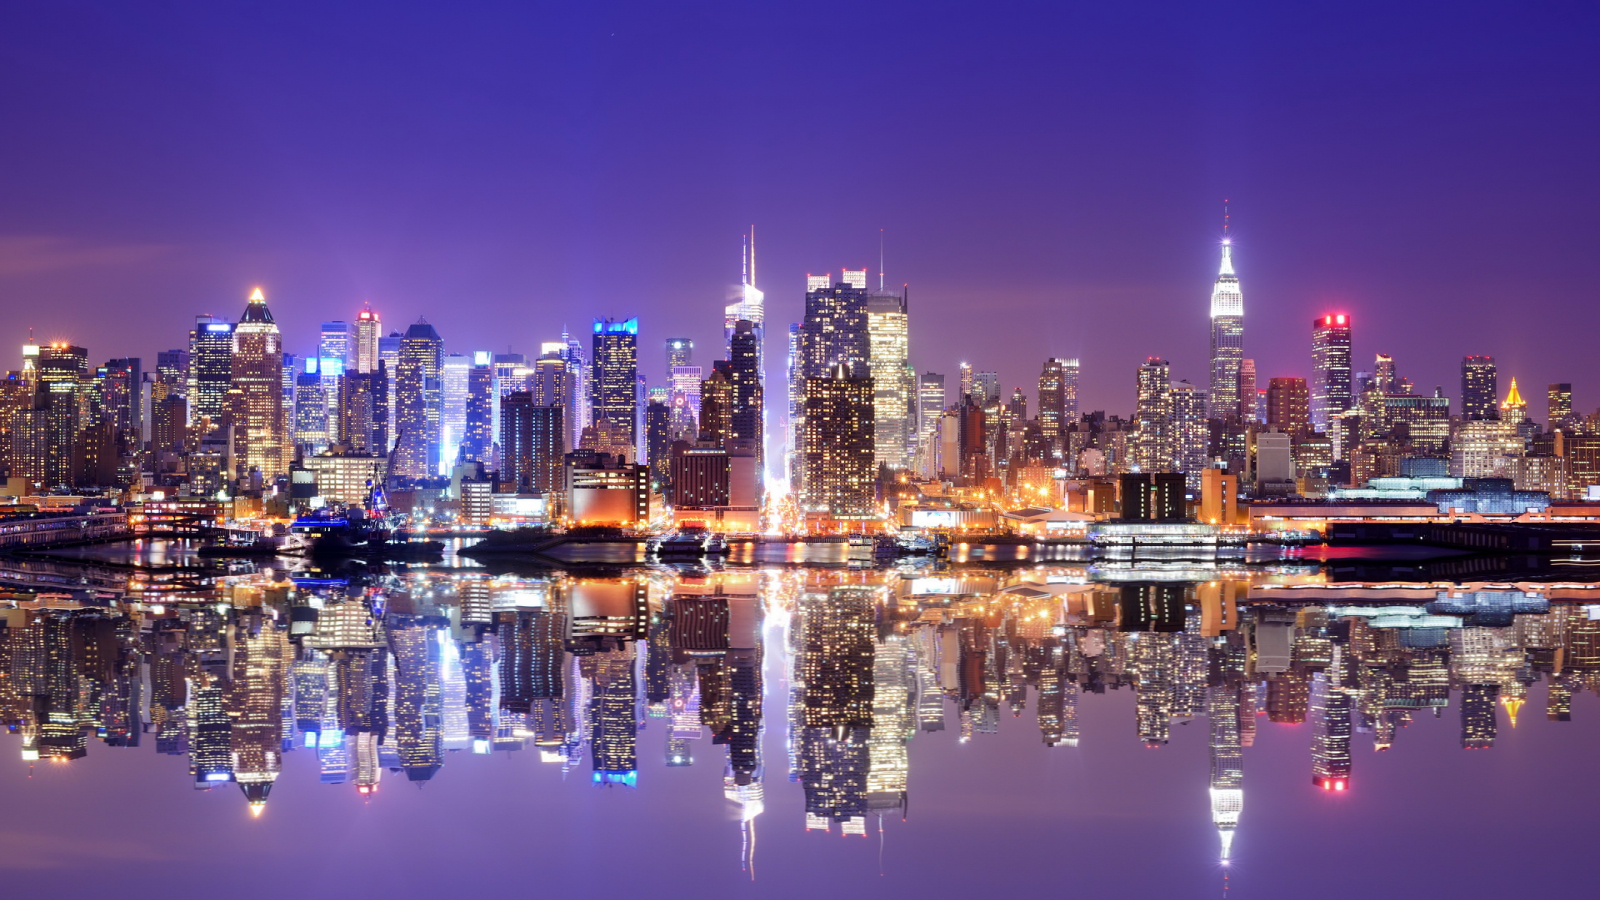 New York City Lights , HD Wallpaper & Backgrounds